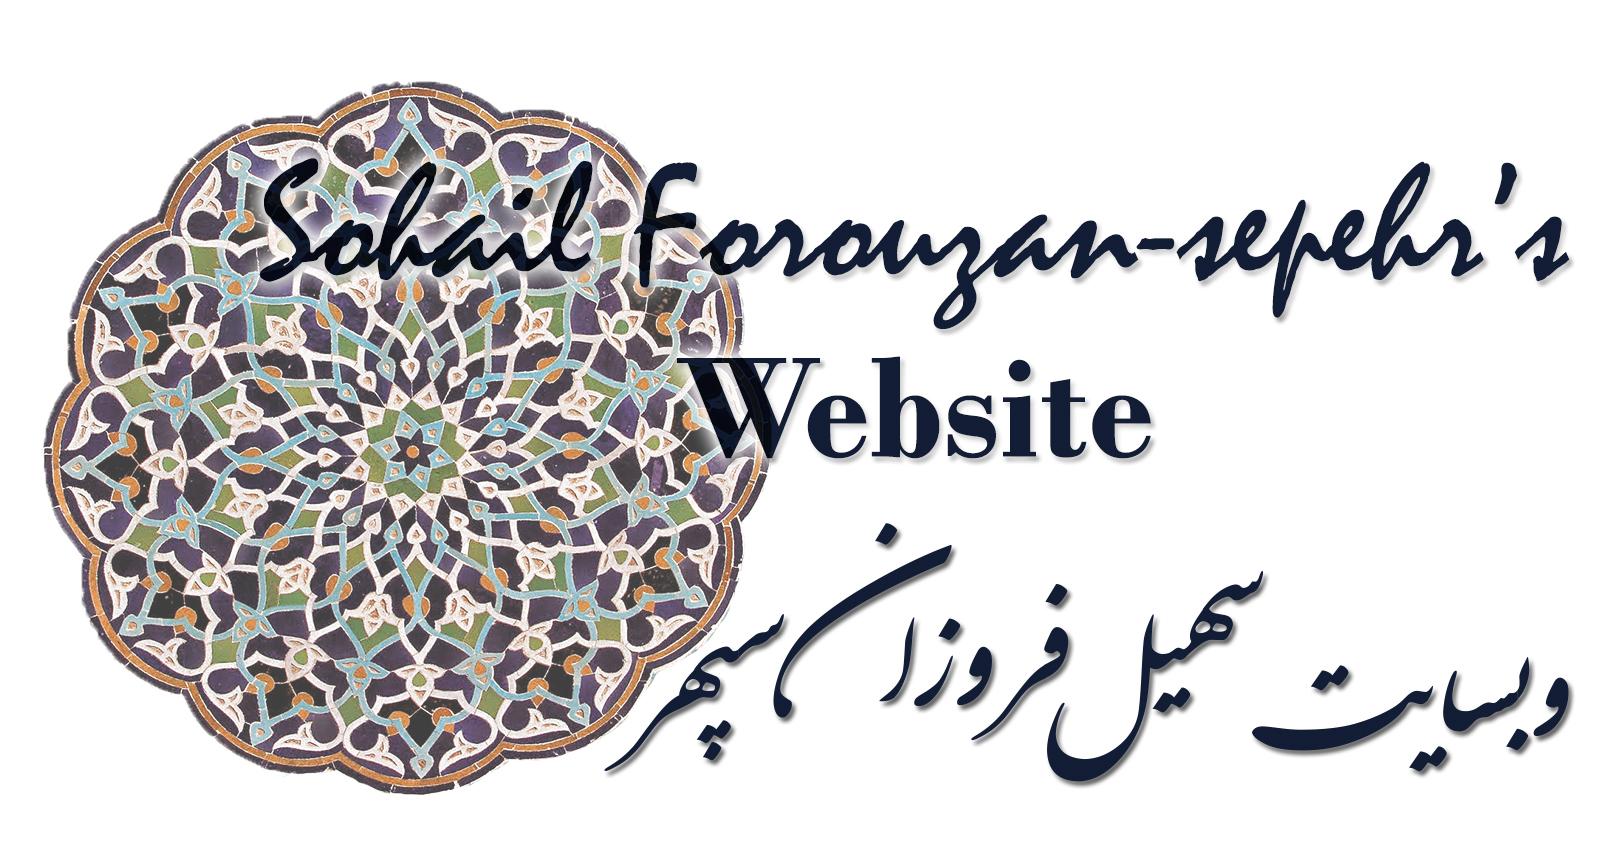 Sohail Forouzan-sepehr's Website